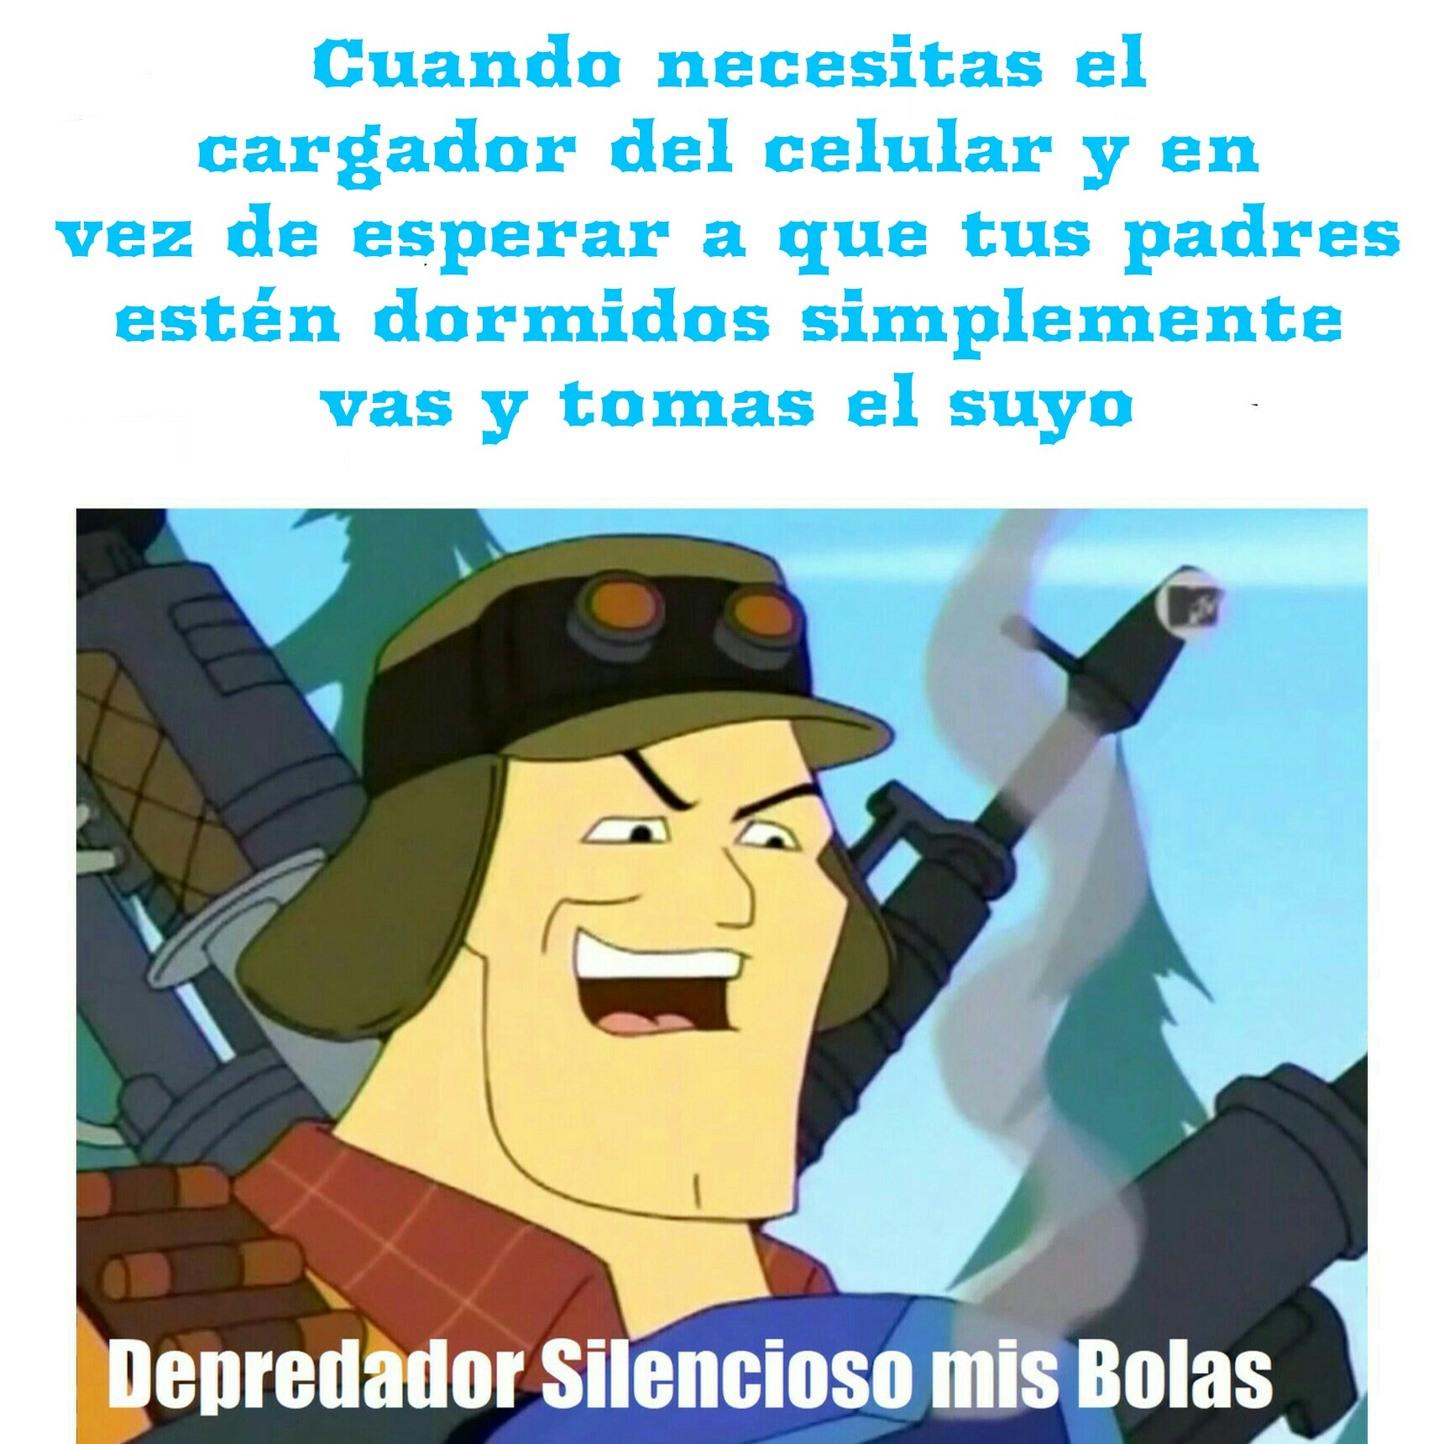 De chiquito - meme